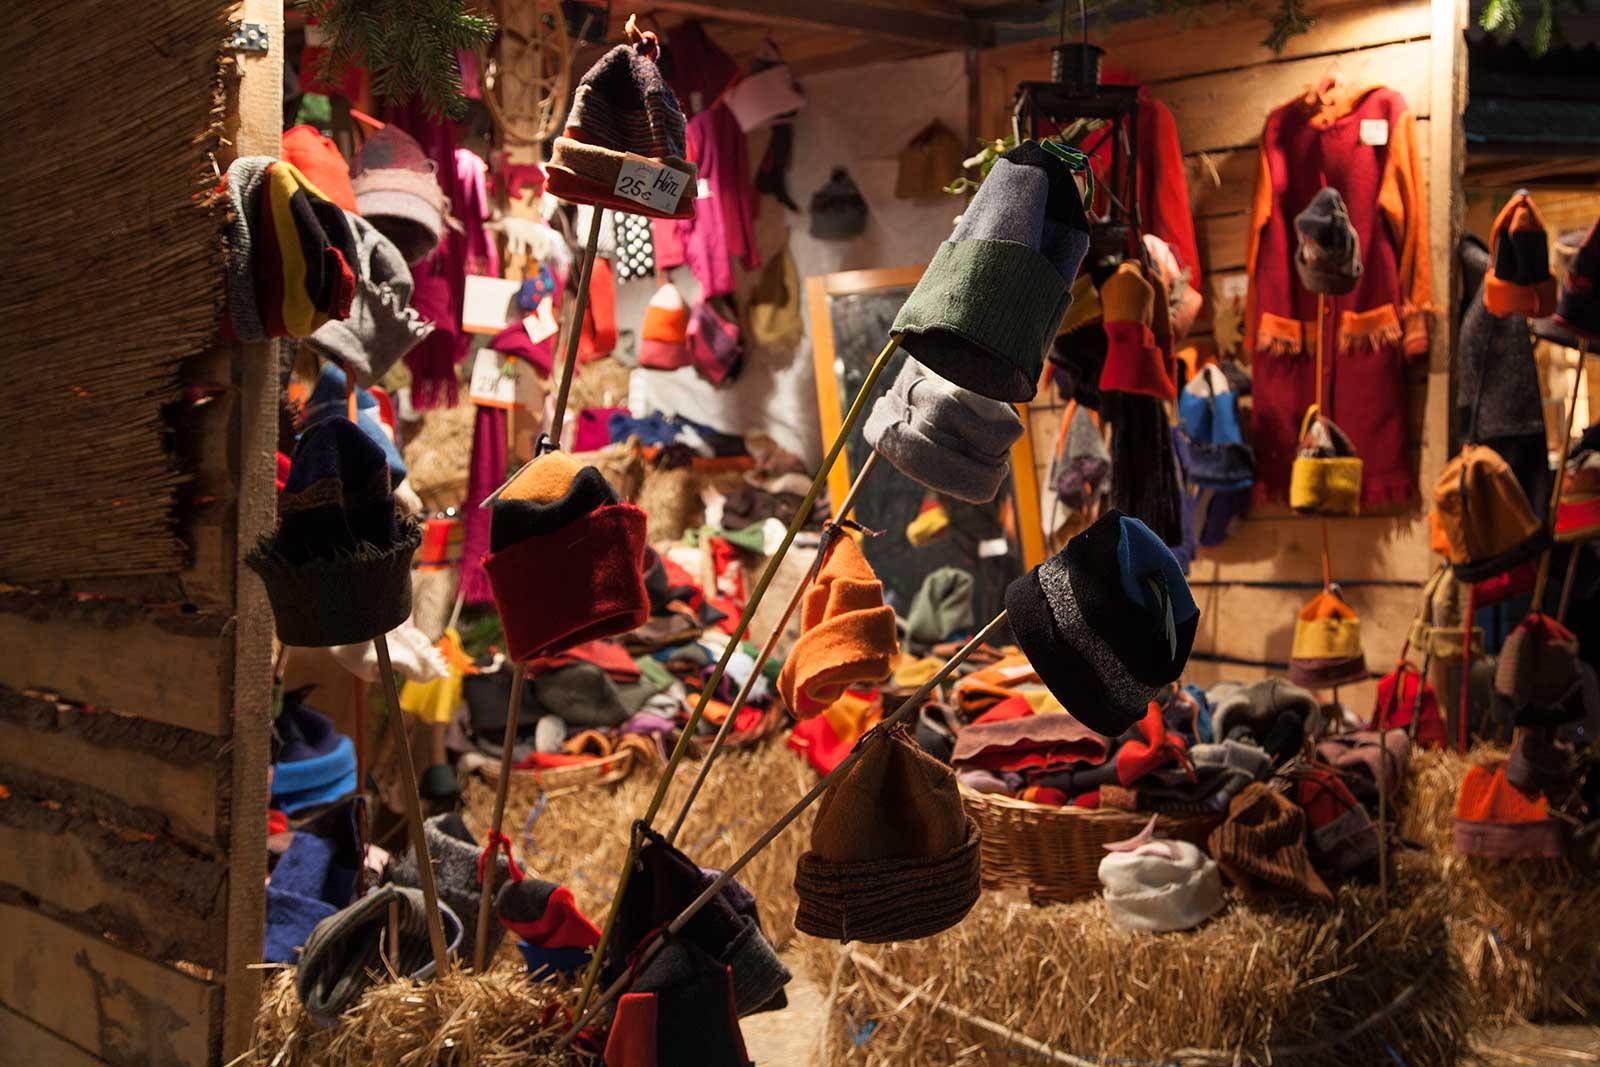 Hat stall at the Christmas market around the Karlsplatz.